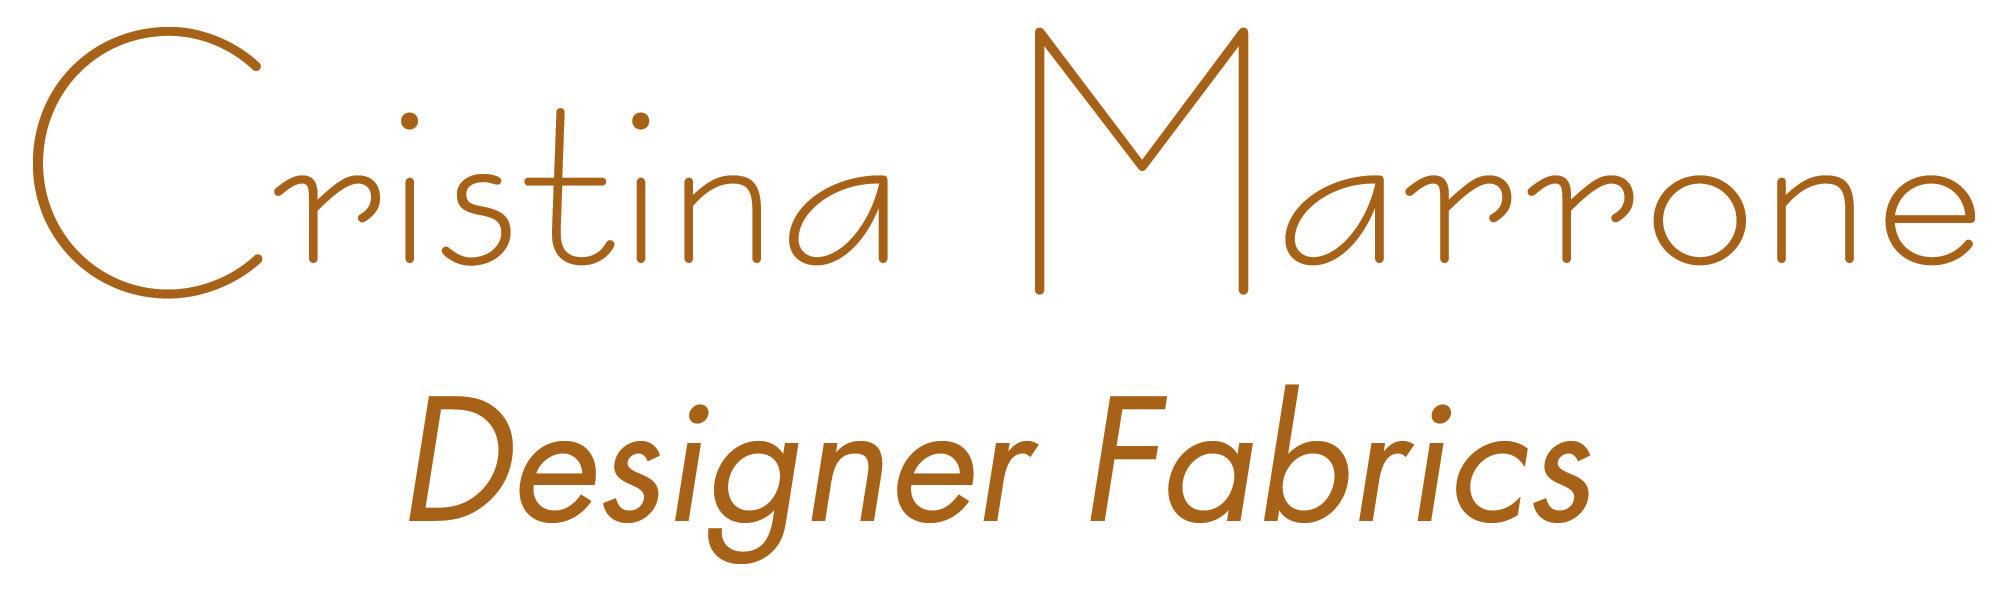 C Marrone Designer Fabrics.jpg covertex